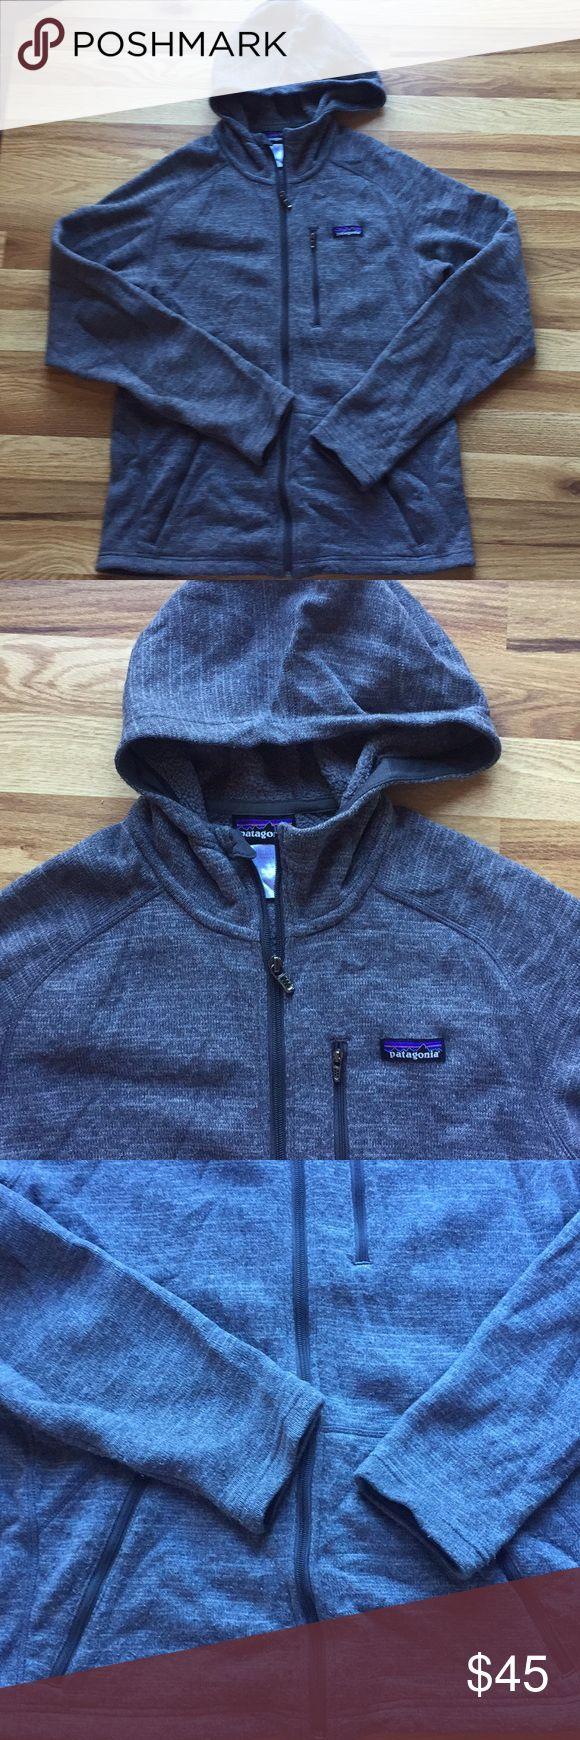 Mens Patagonia sweater Jacket Mens Patagonia Hooded  Sweater Jacket . Preloved. Breast and kangaroos zip up pockets . Has piling. Still has lots of life left Patagonia Jackets & Coats